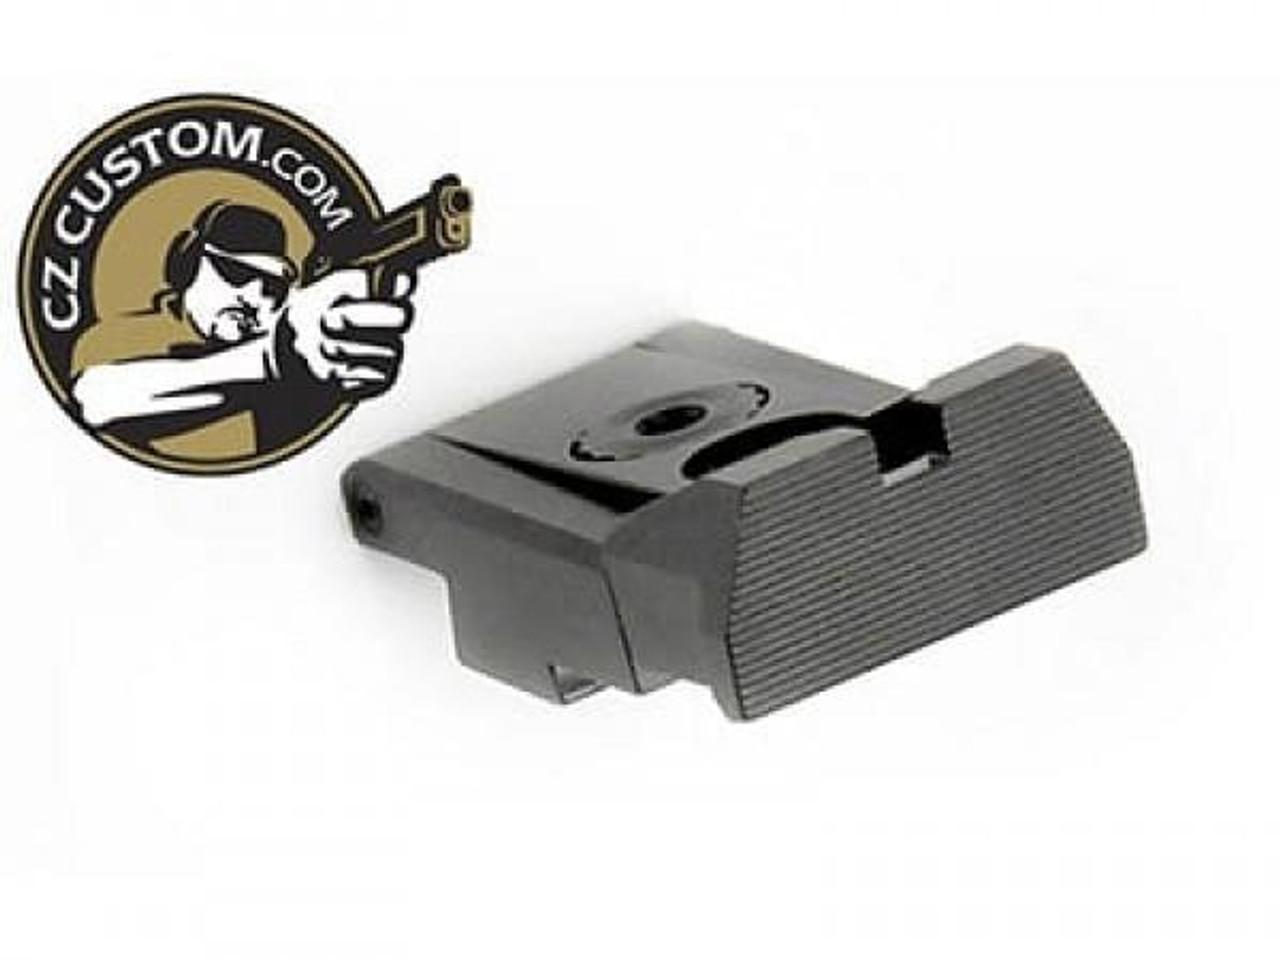 CZ Rear Sight Tactical Hajo Fits 75 Shadow & SP01 Shadow